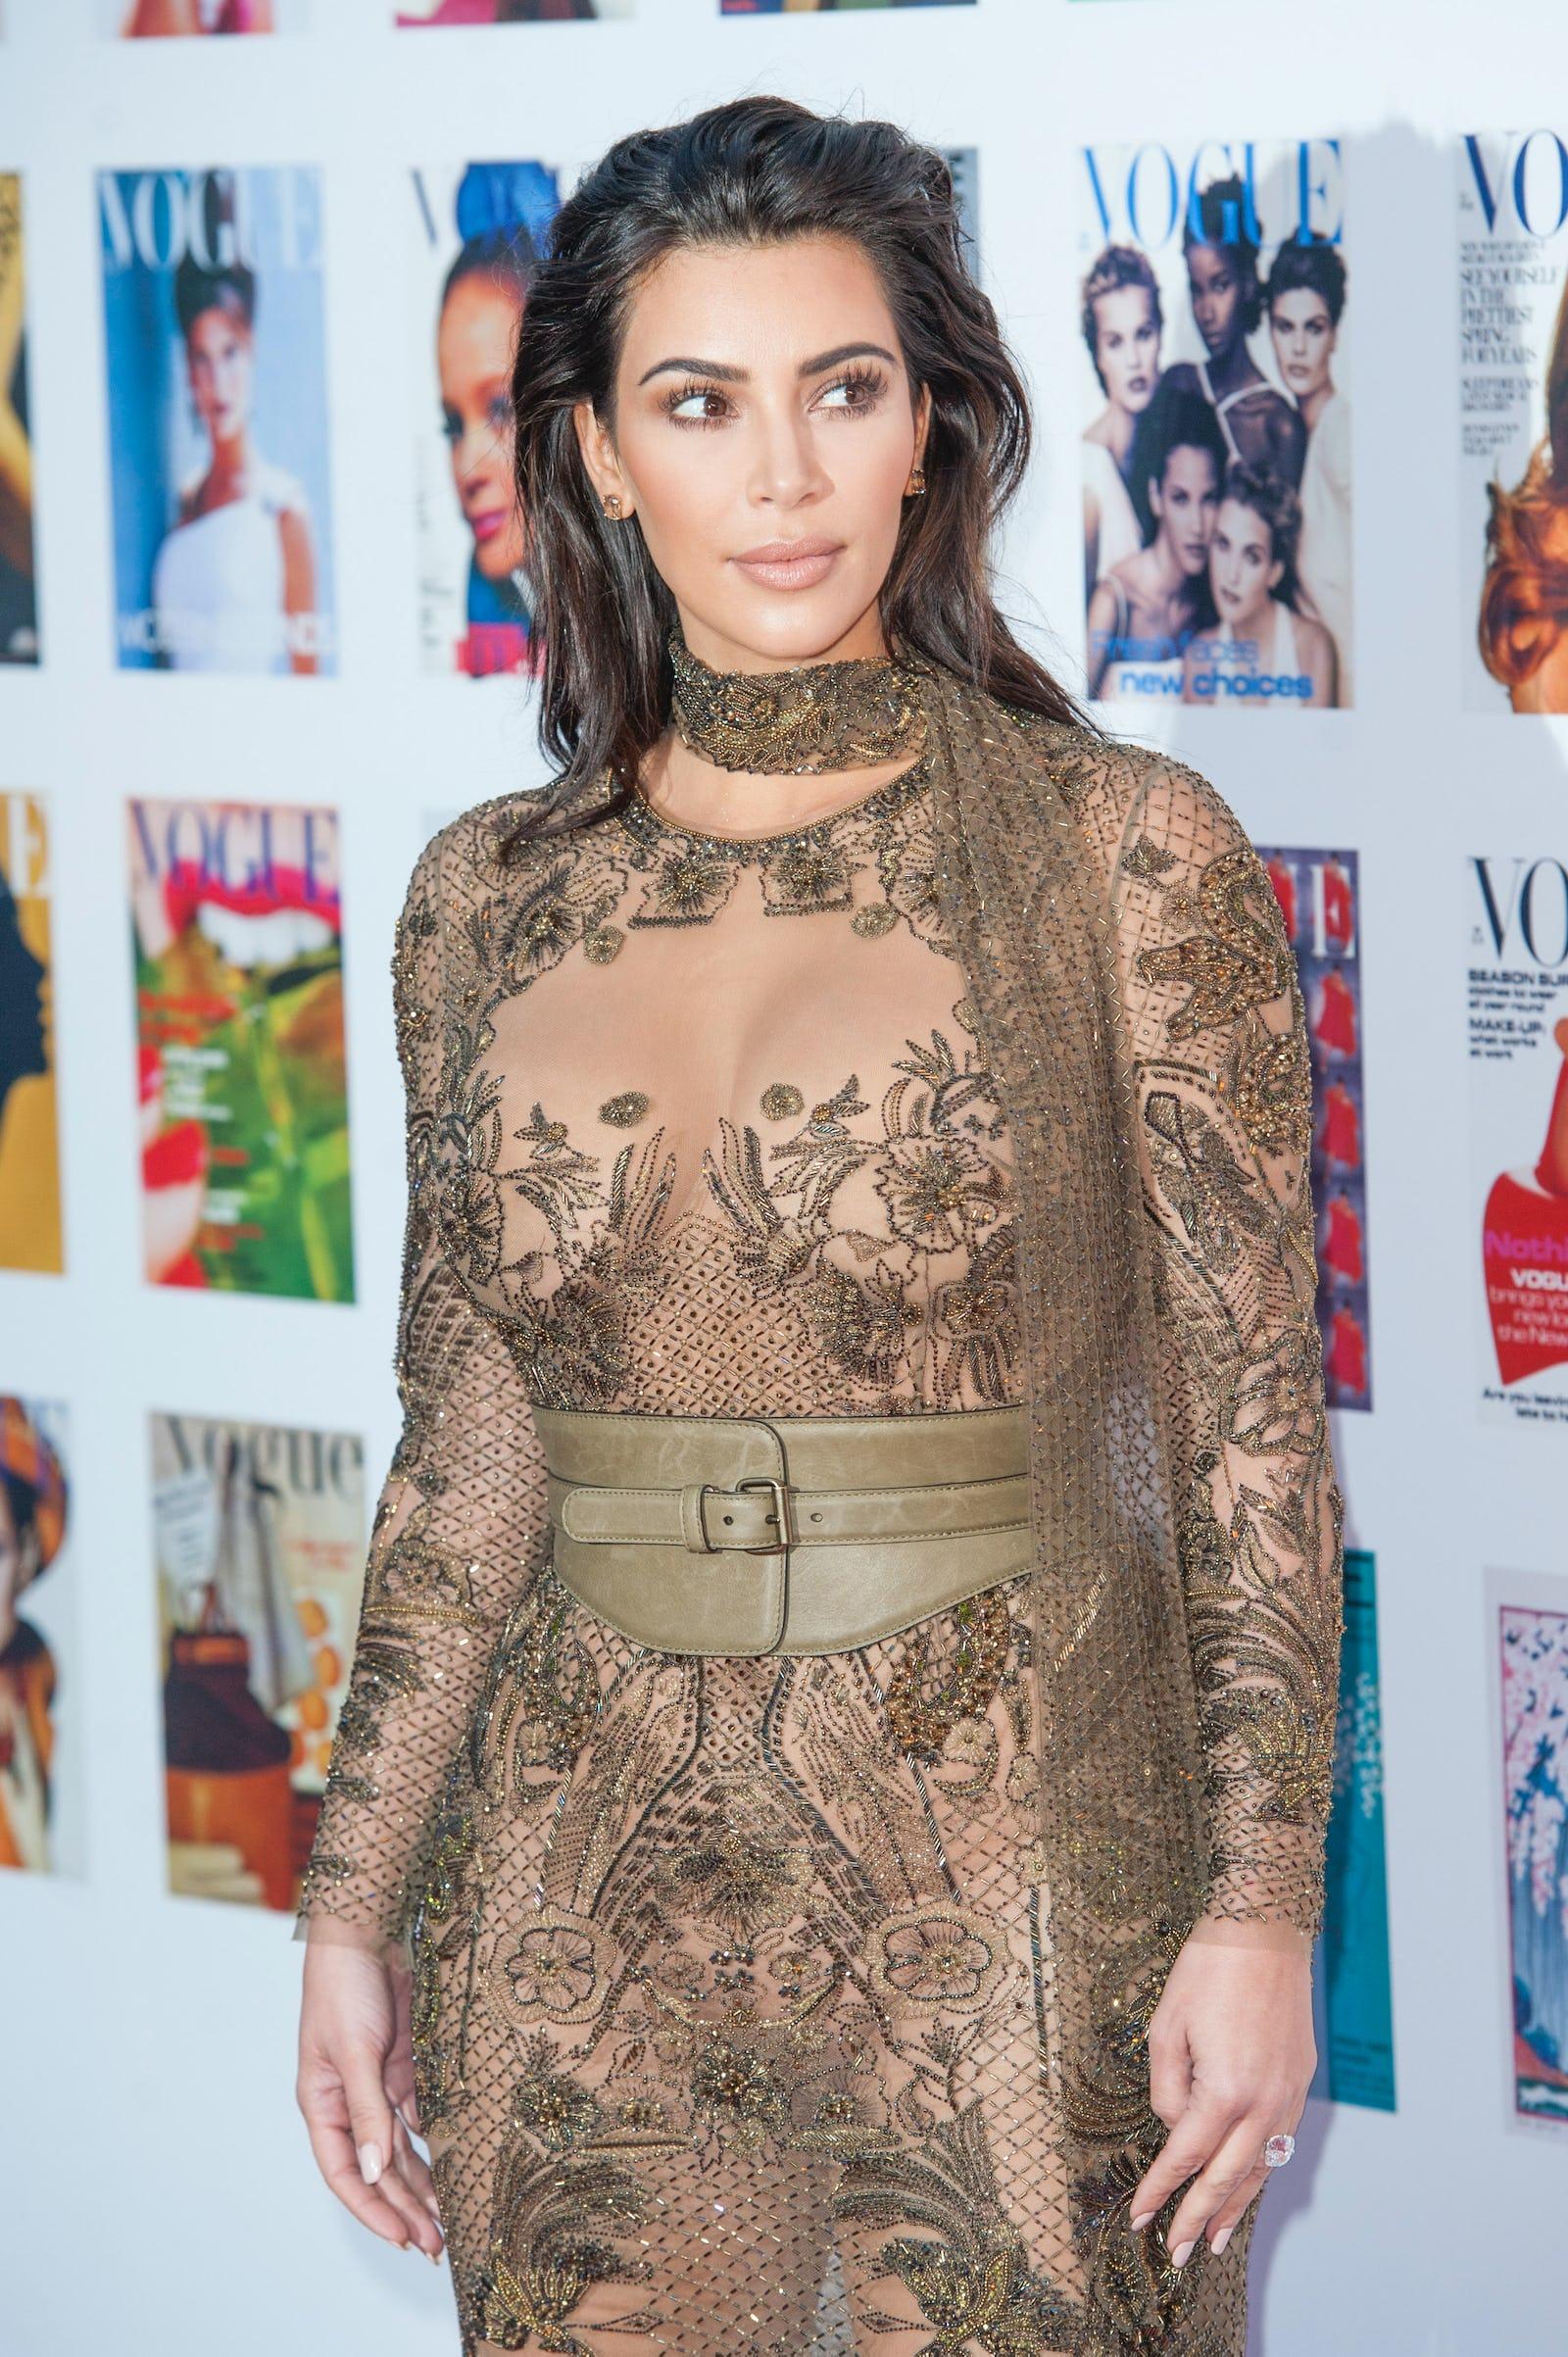 Kim Kardashian Has An Empowering Response To Critics Of